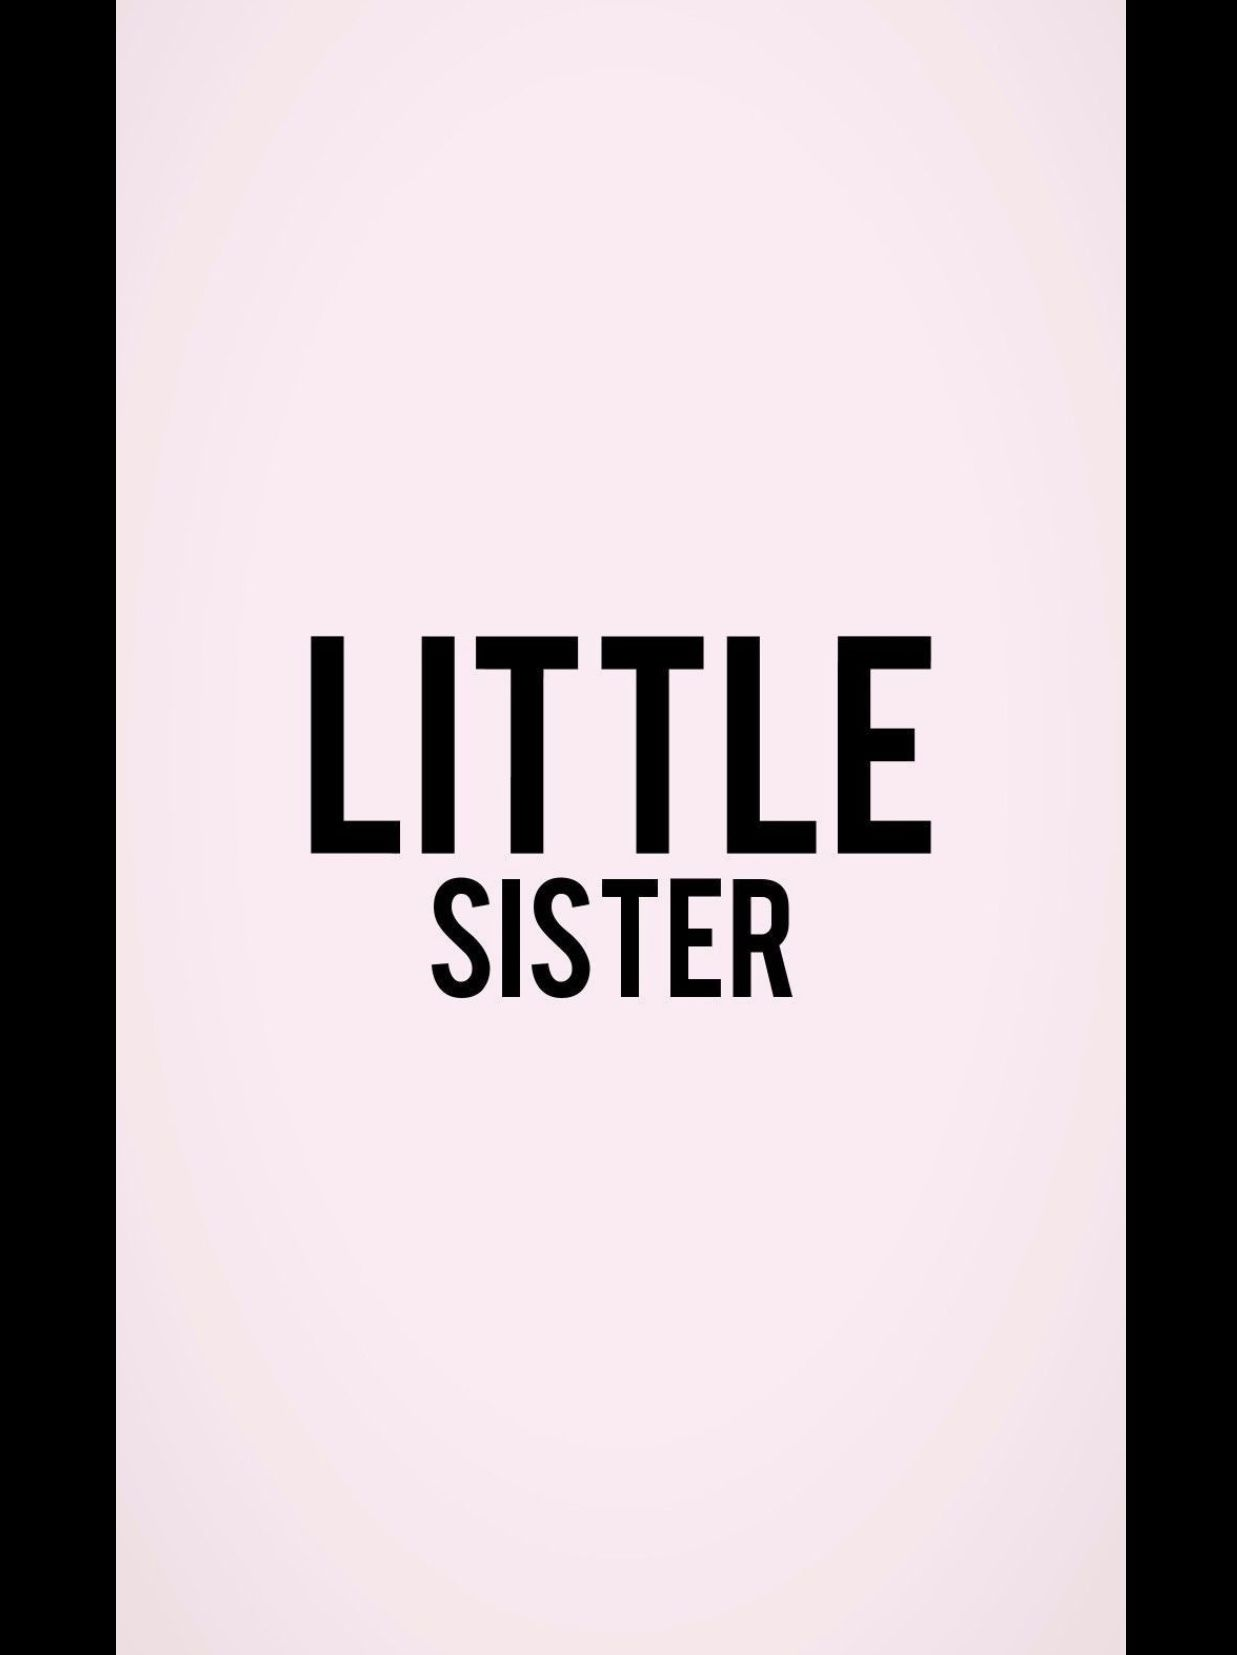 Little Sister Sister Wallpaper Sisters Drawing Matching Wallpaper